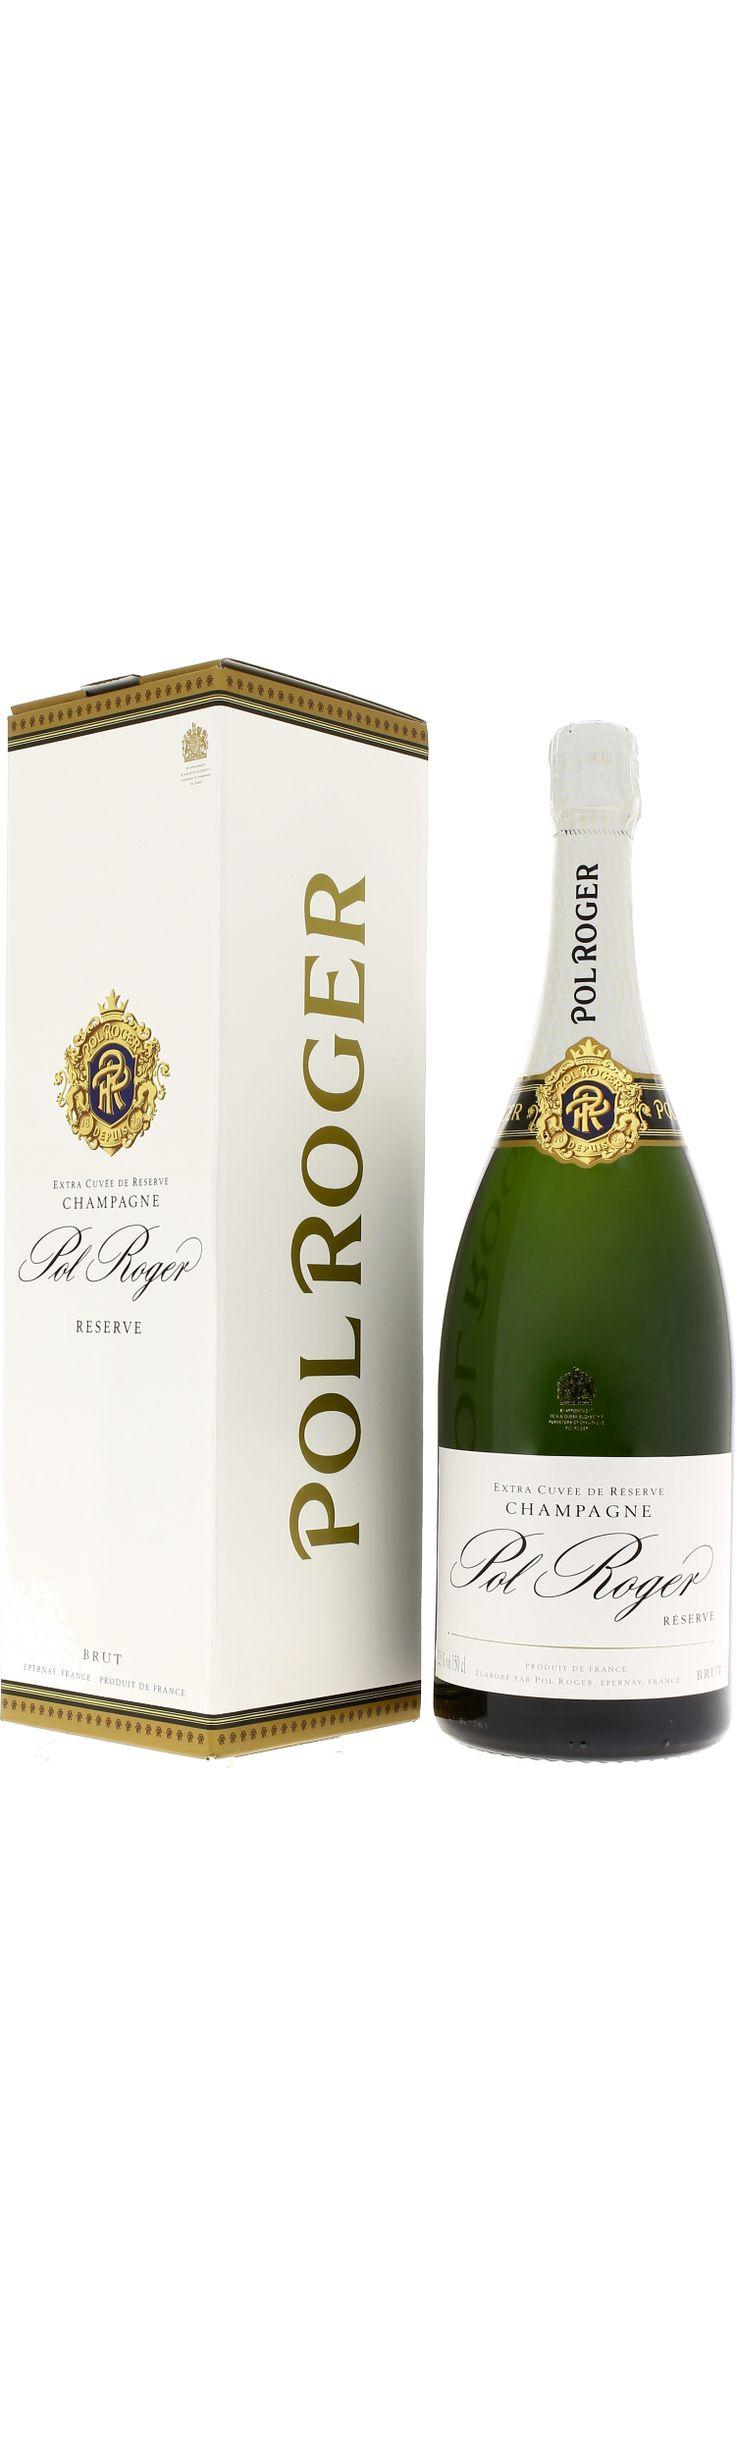 POL ROGER BRUT RESERVE MAGNUM - achat/vente de Champagne